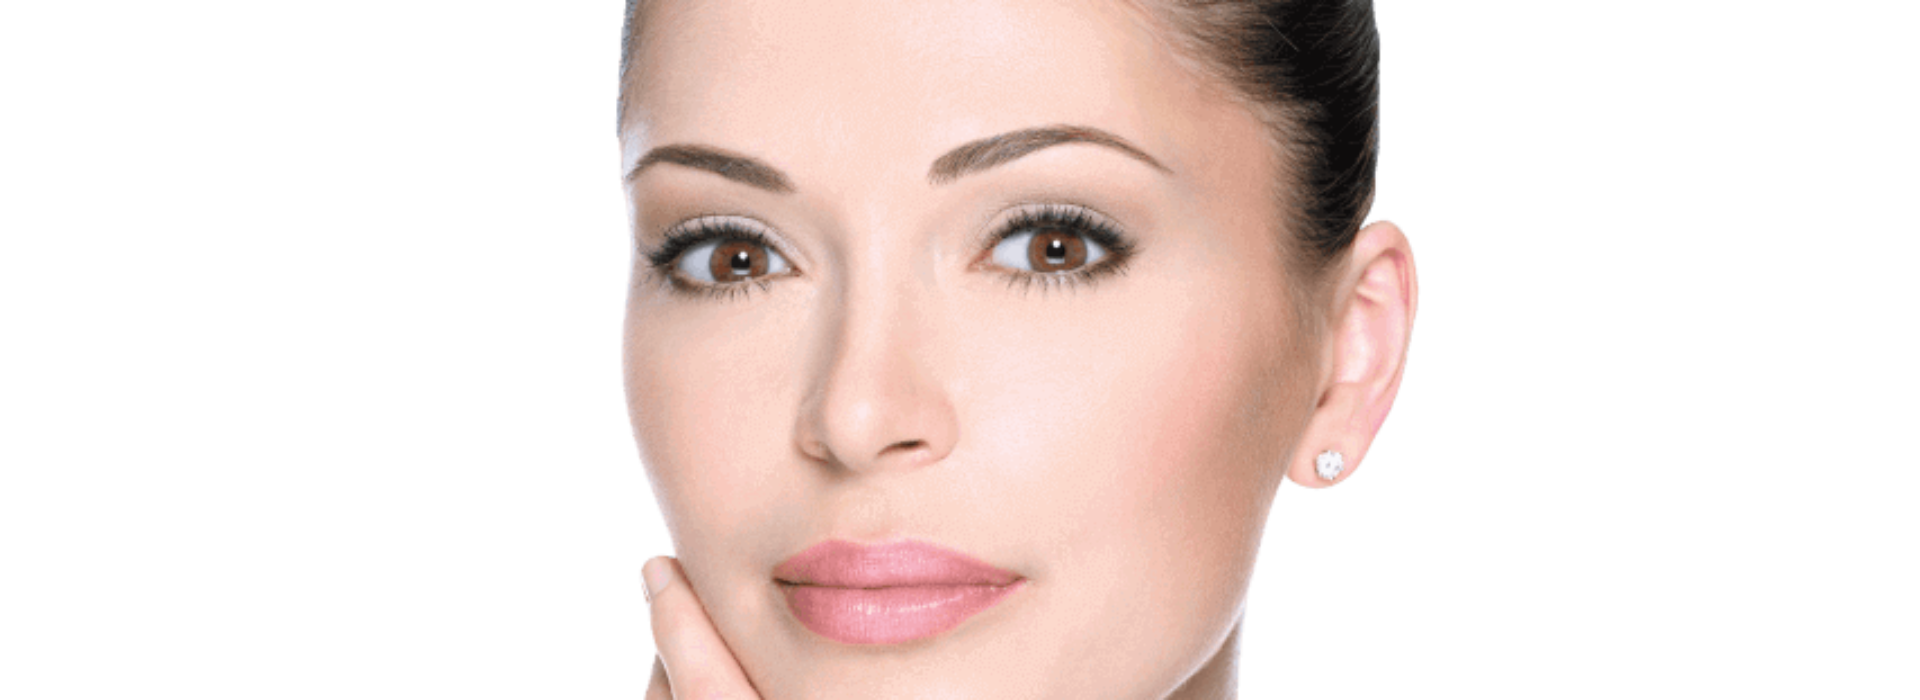 Le Petite Skincare and Permanent Make Up